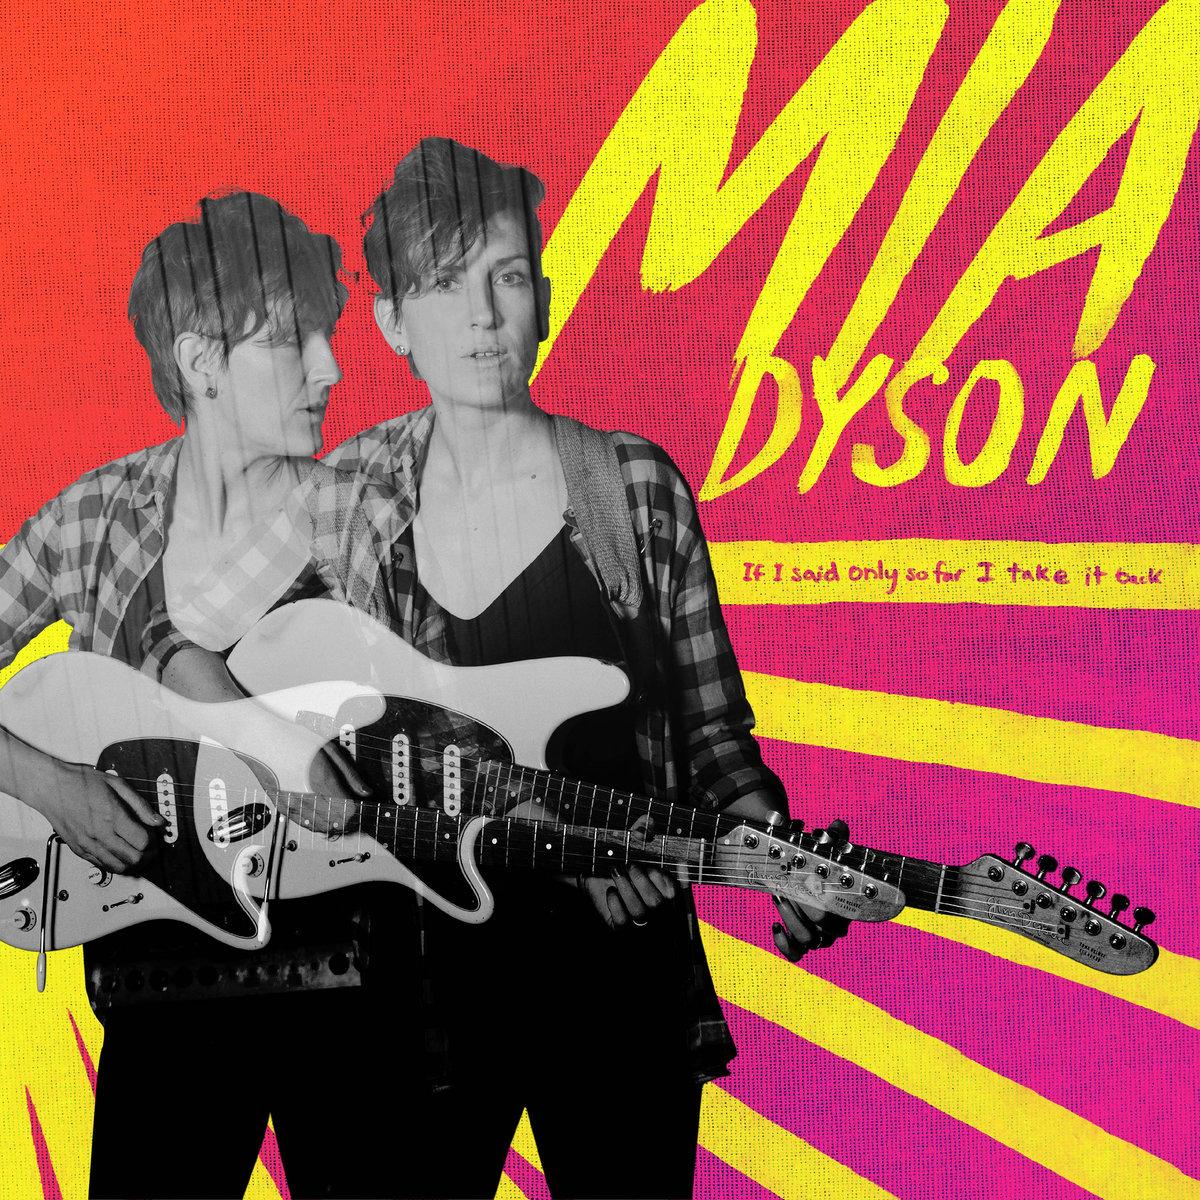 Mia Dyson  If I Said Only So Far I Take It Back Single Lock / Cooking Vinyl (2017)